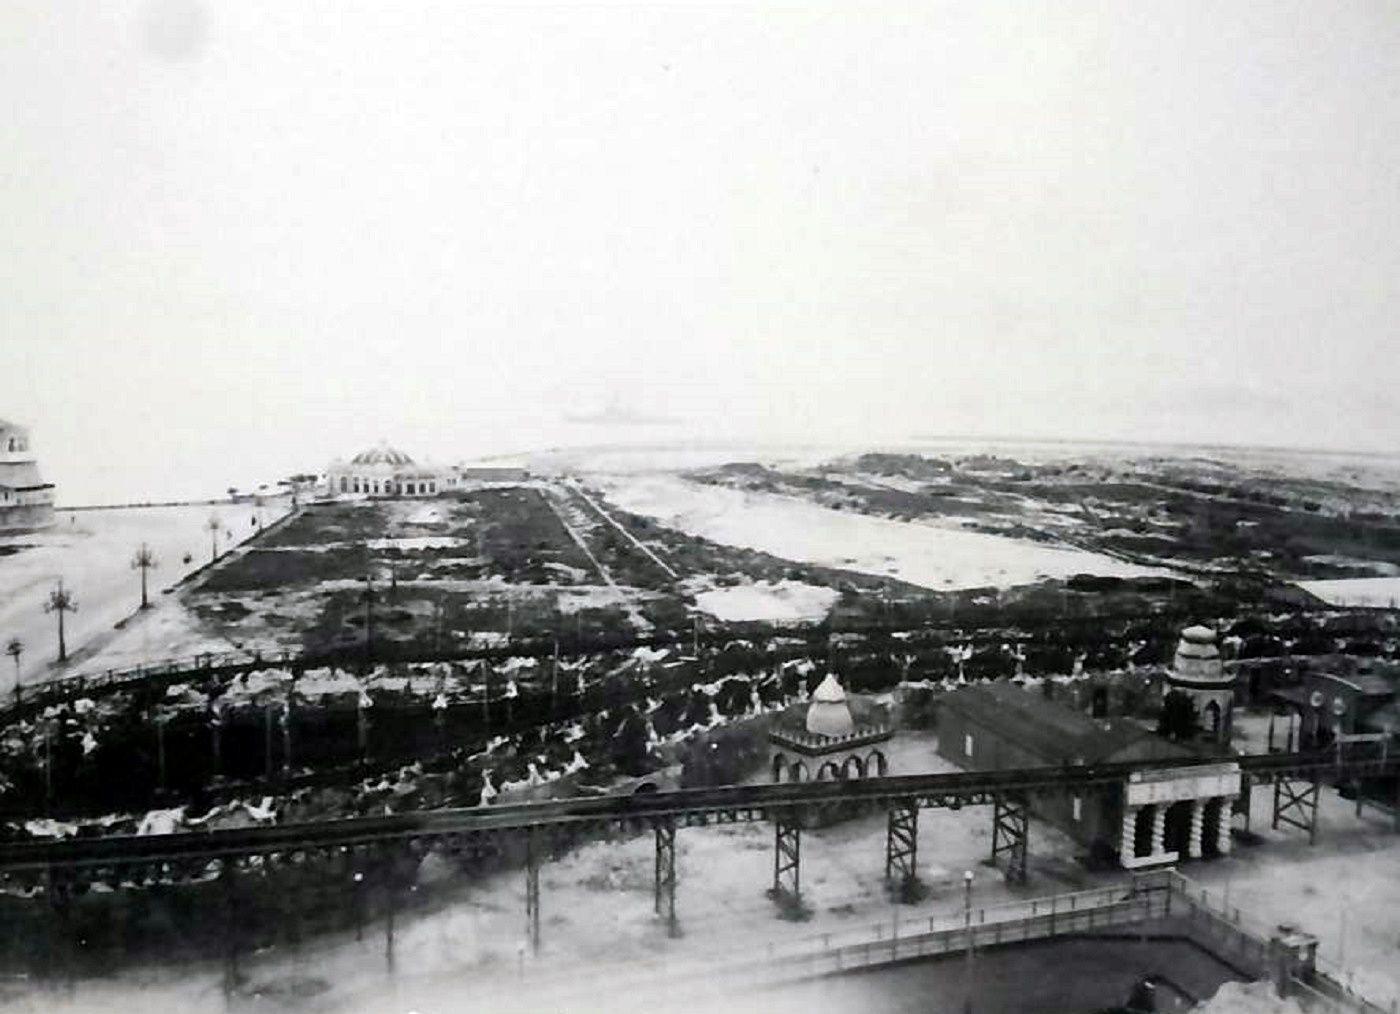 Parque de diversões no aterro da Glória, decada de 1920.  https://www.facebook.com/Guarantiga?fref=ts